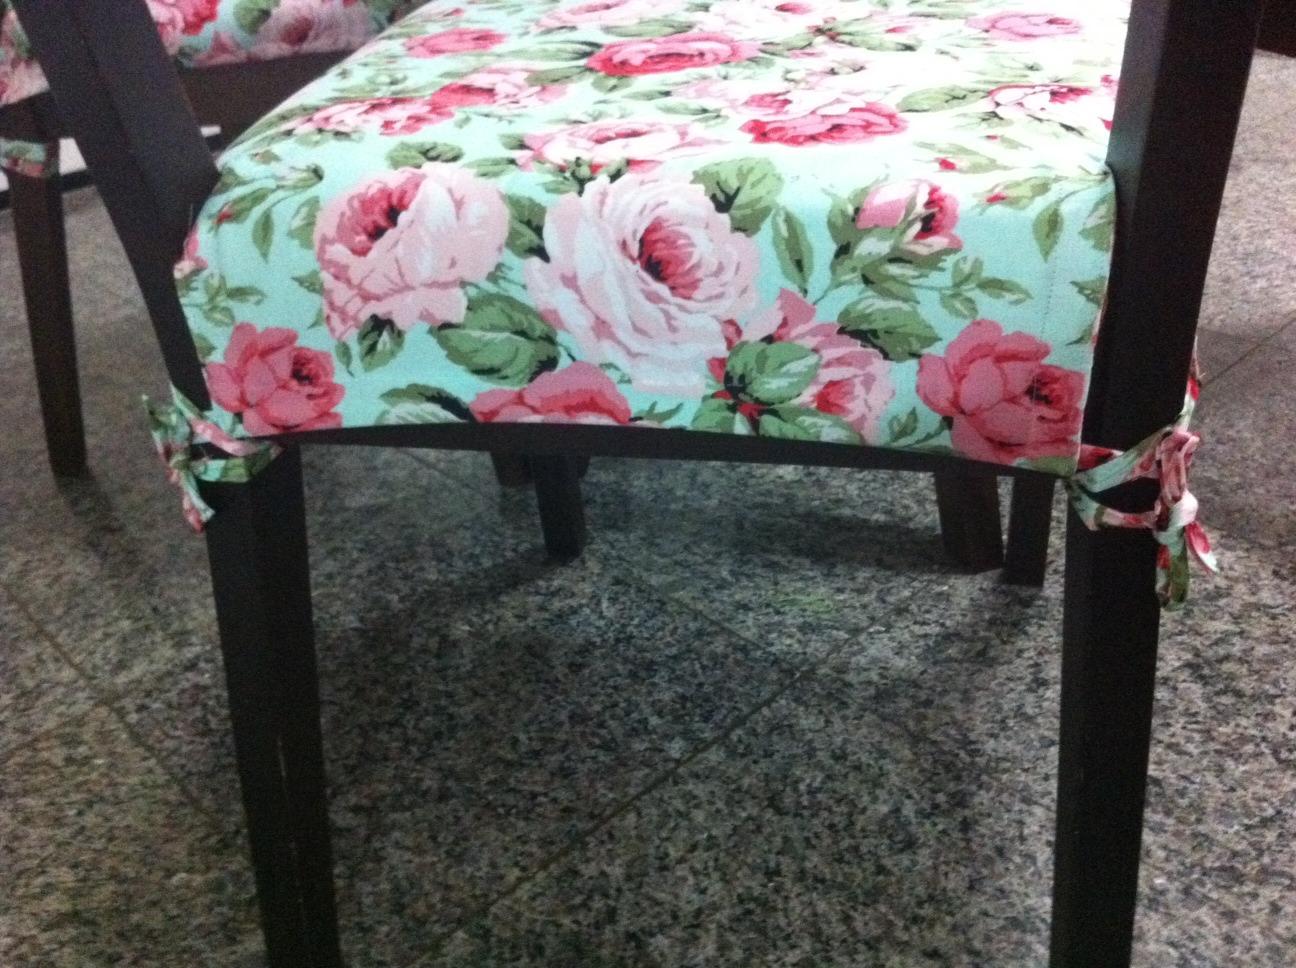 capa para cadeira capa para cadeira capa para cadeira #8F3C5D 1296x968